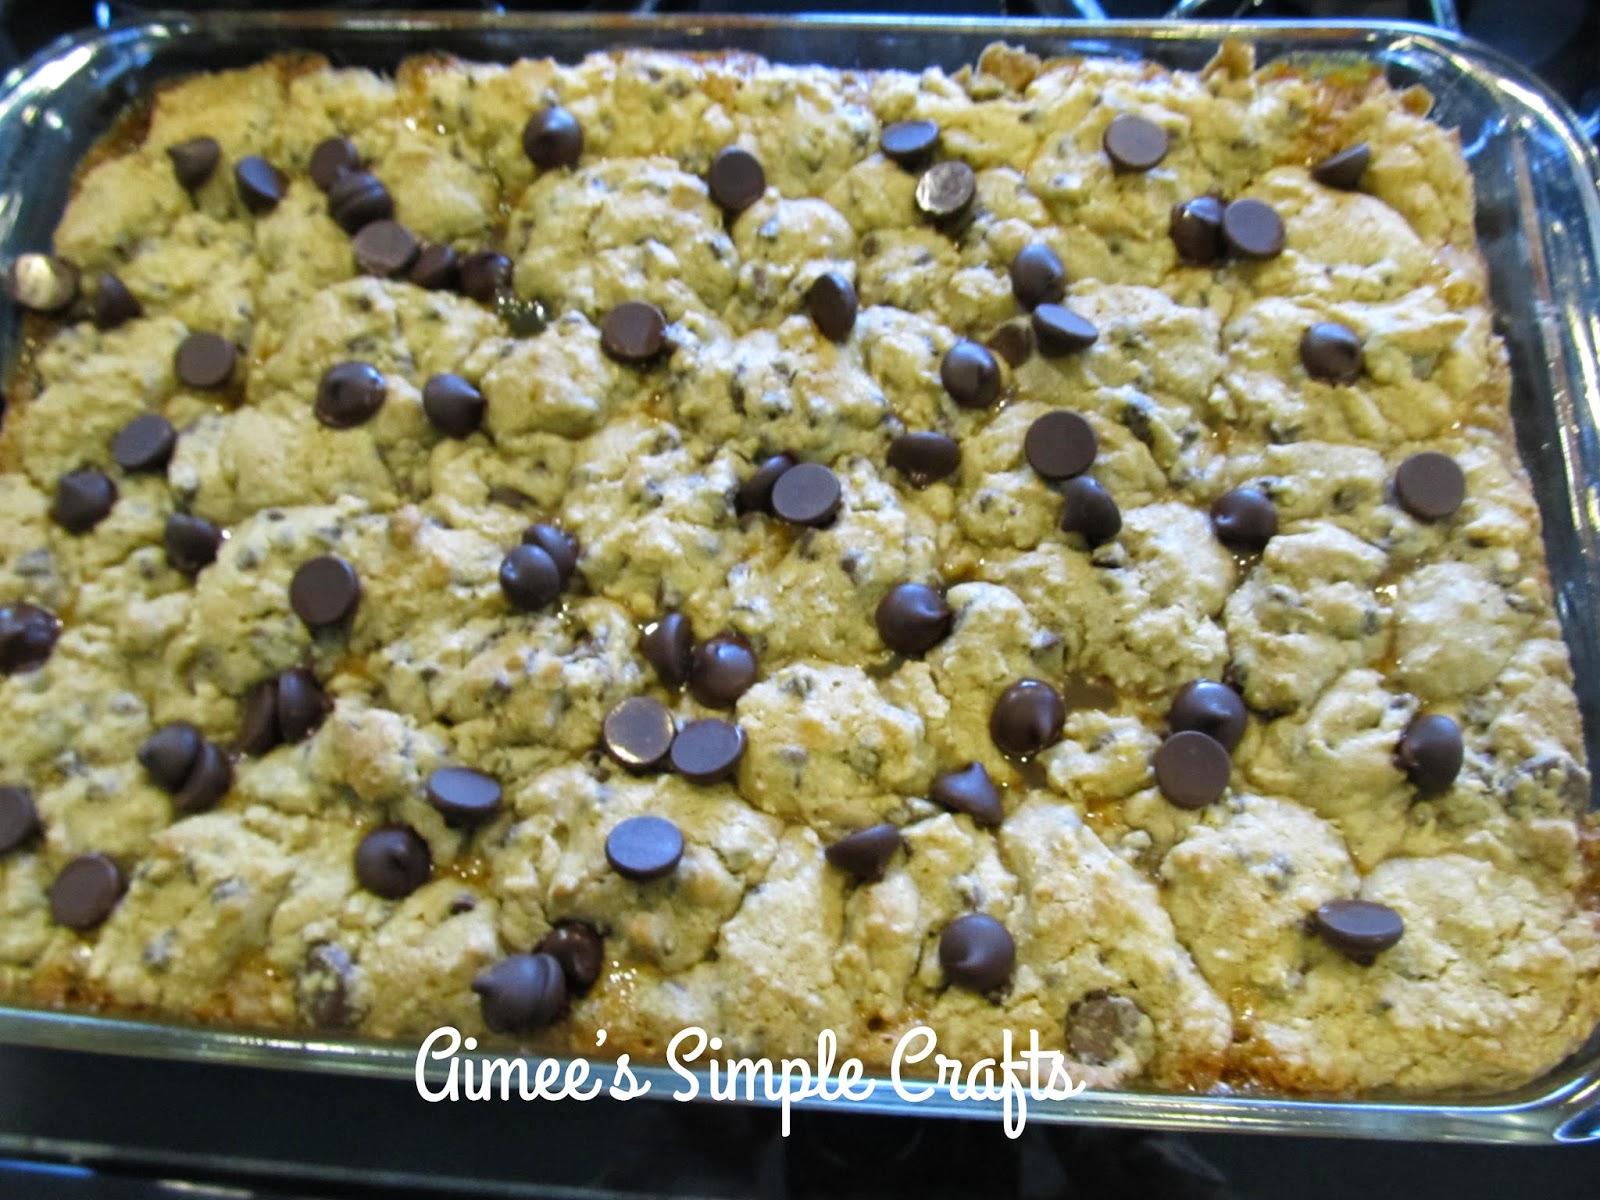 Aimee's Simple Crafts: Oreo and Caramel Stuffed Chocolate ...